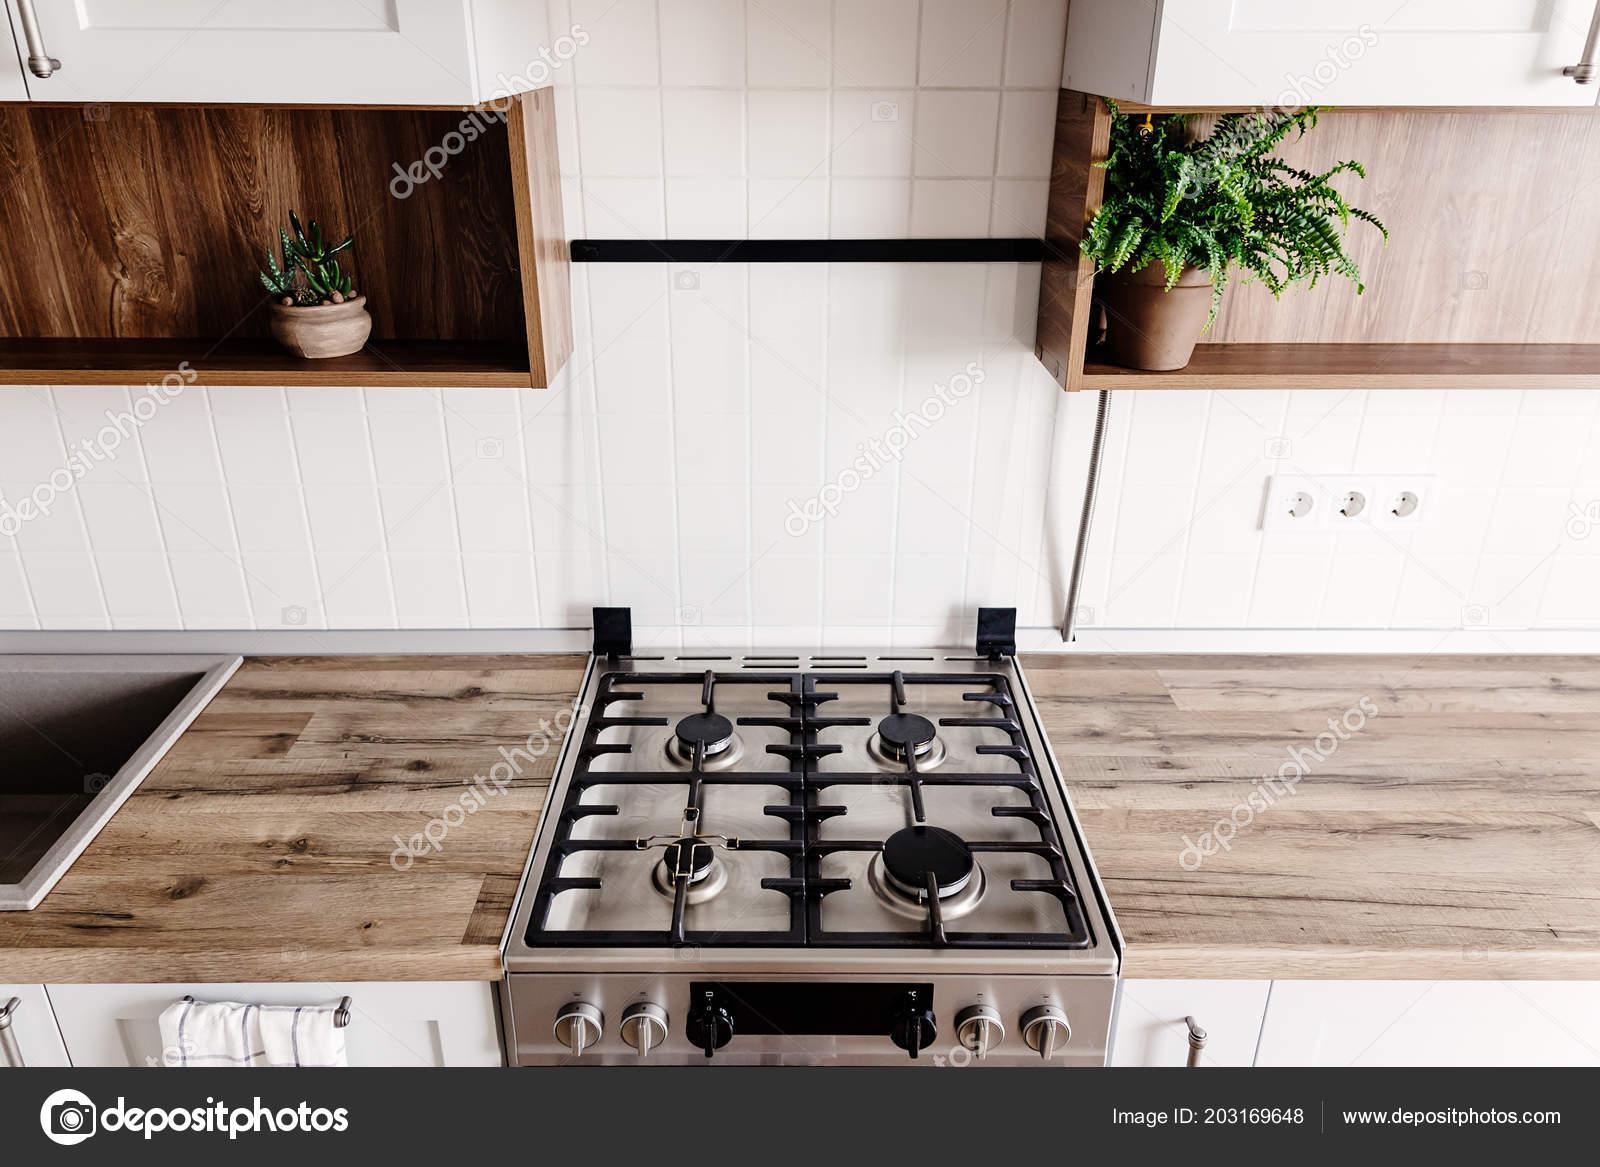 Interieur Staal Interieur : Close staal kachel moderne stijlvolle lichte grijze keuken interieur